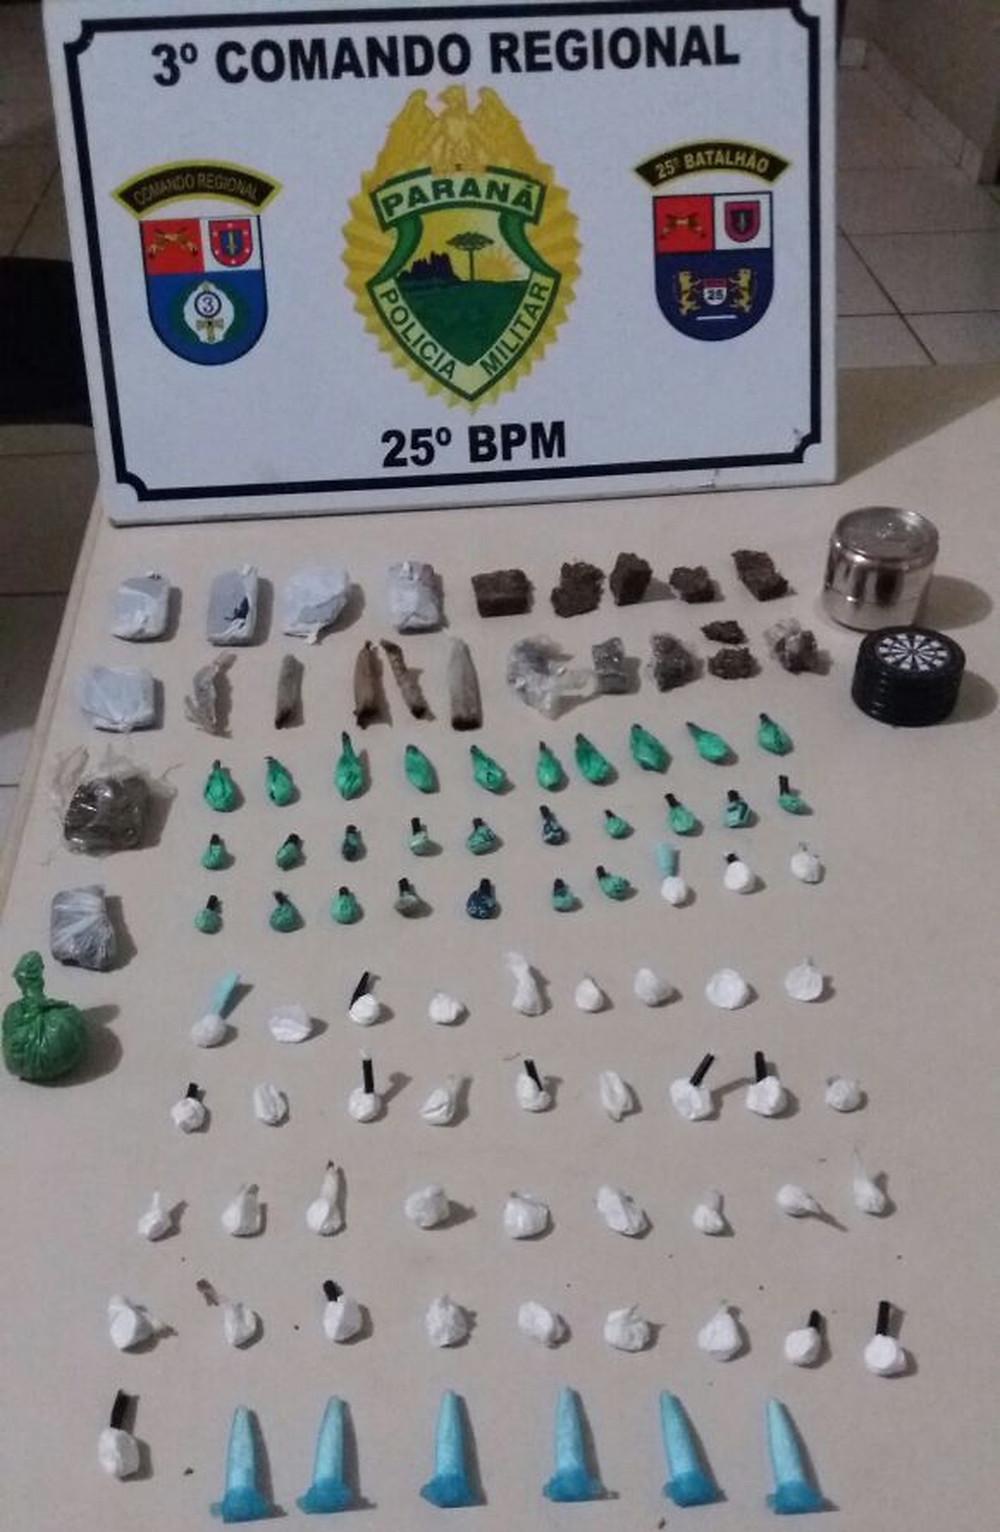 Policia Militar apreende sete jovens após denúncia de consumo de drogas ilícitas por menores de idade.